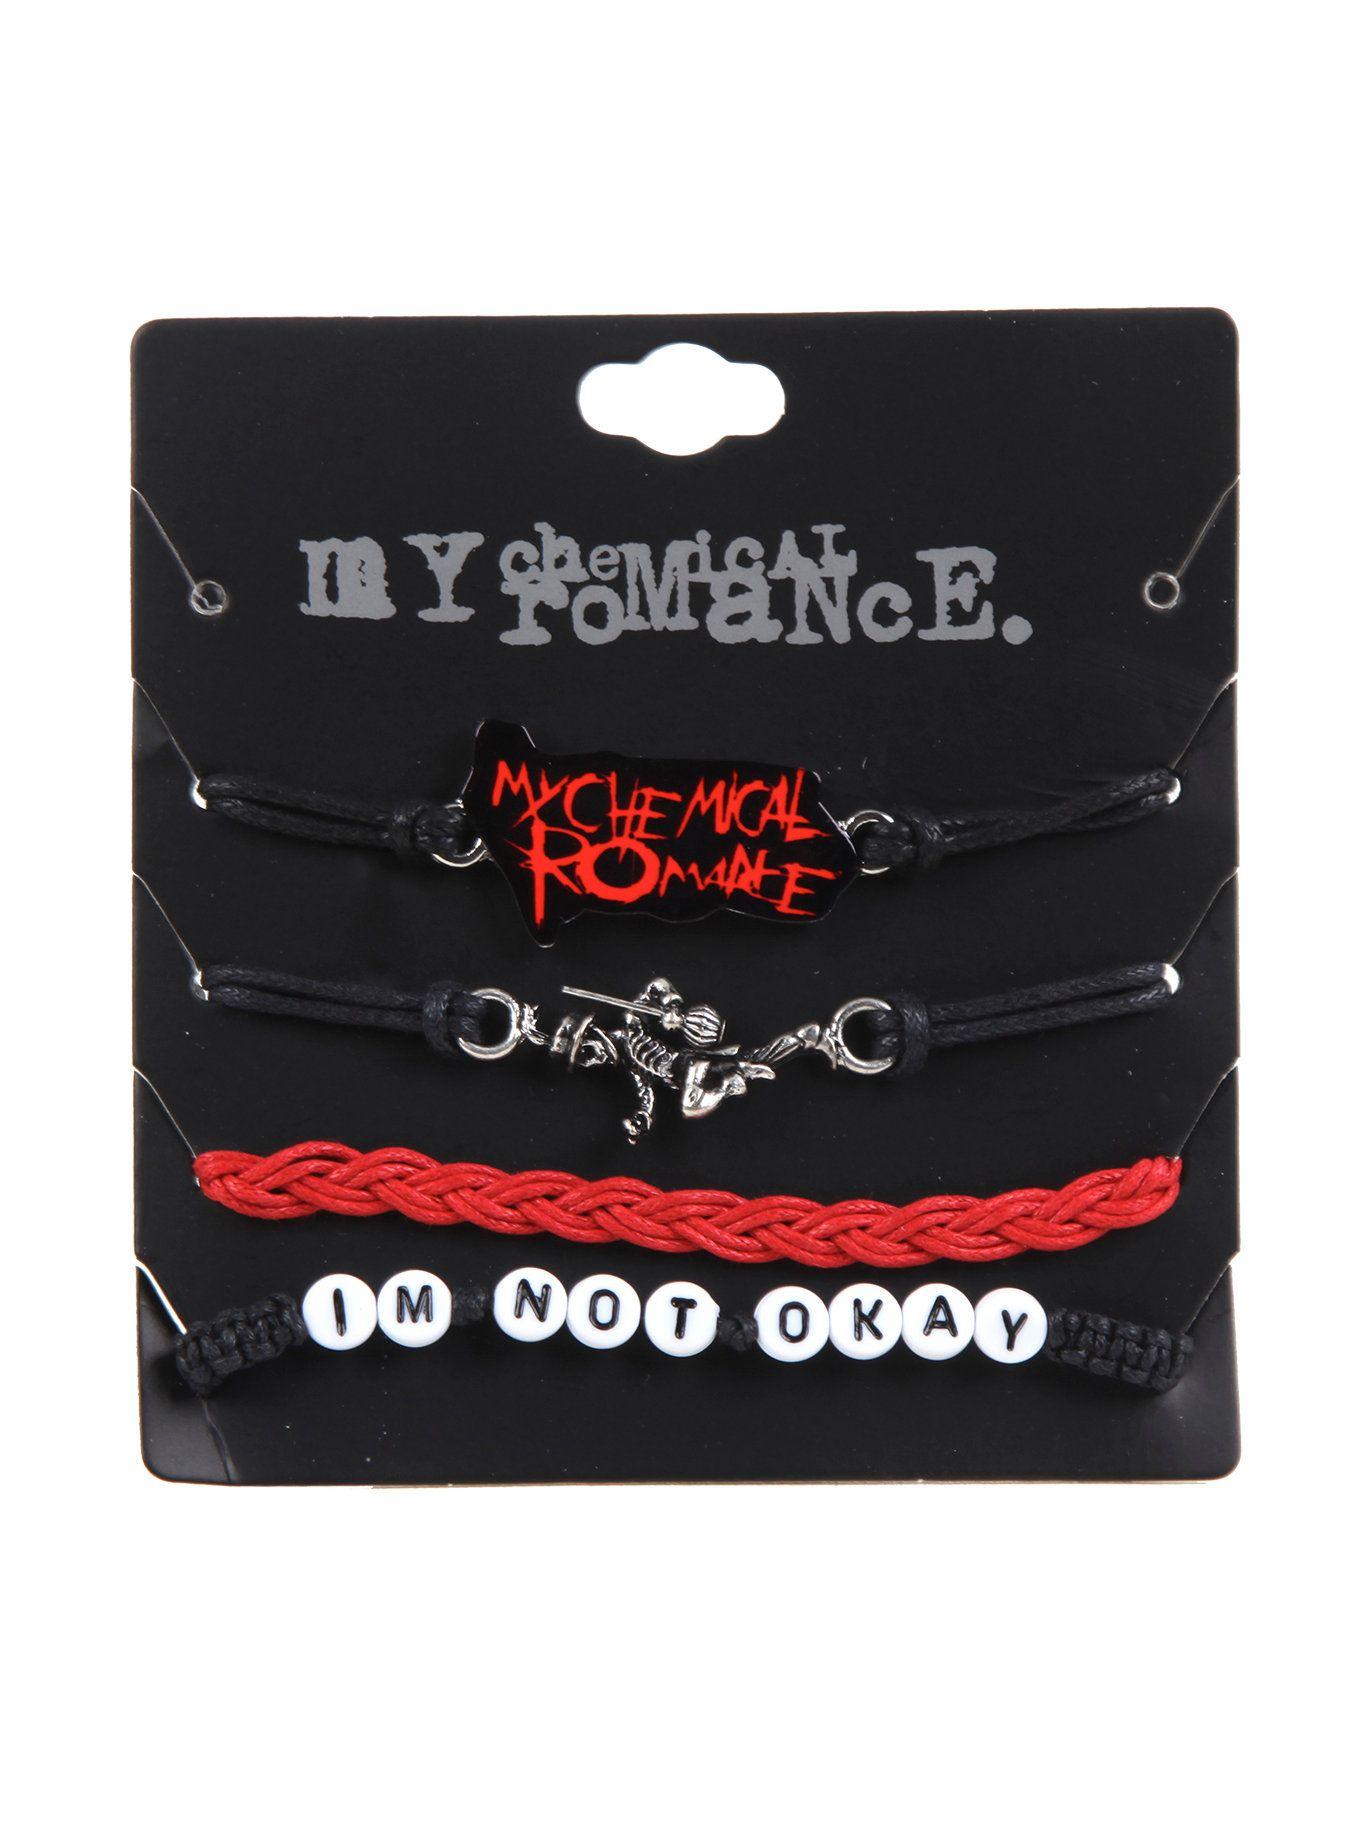 MY CHEMICAL ROMANCE CORD BRACELET SET | Cord bracelet set with My Chemical Romance themed designs.